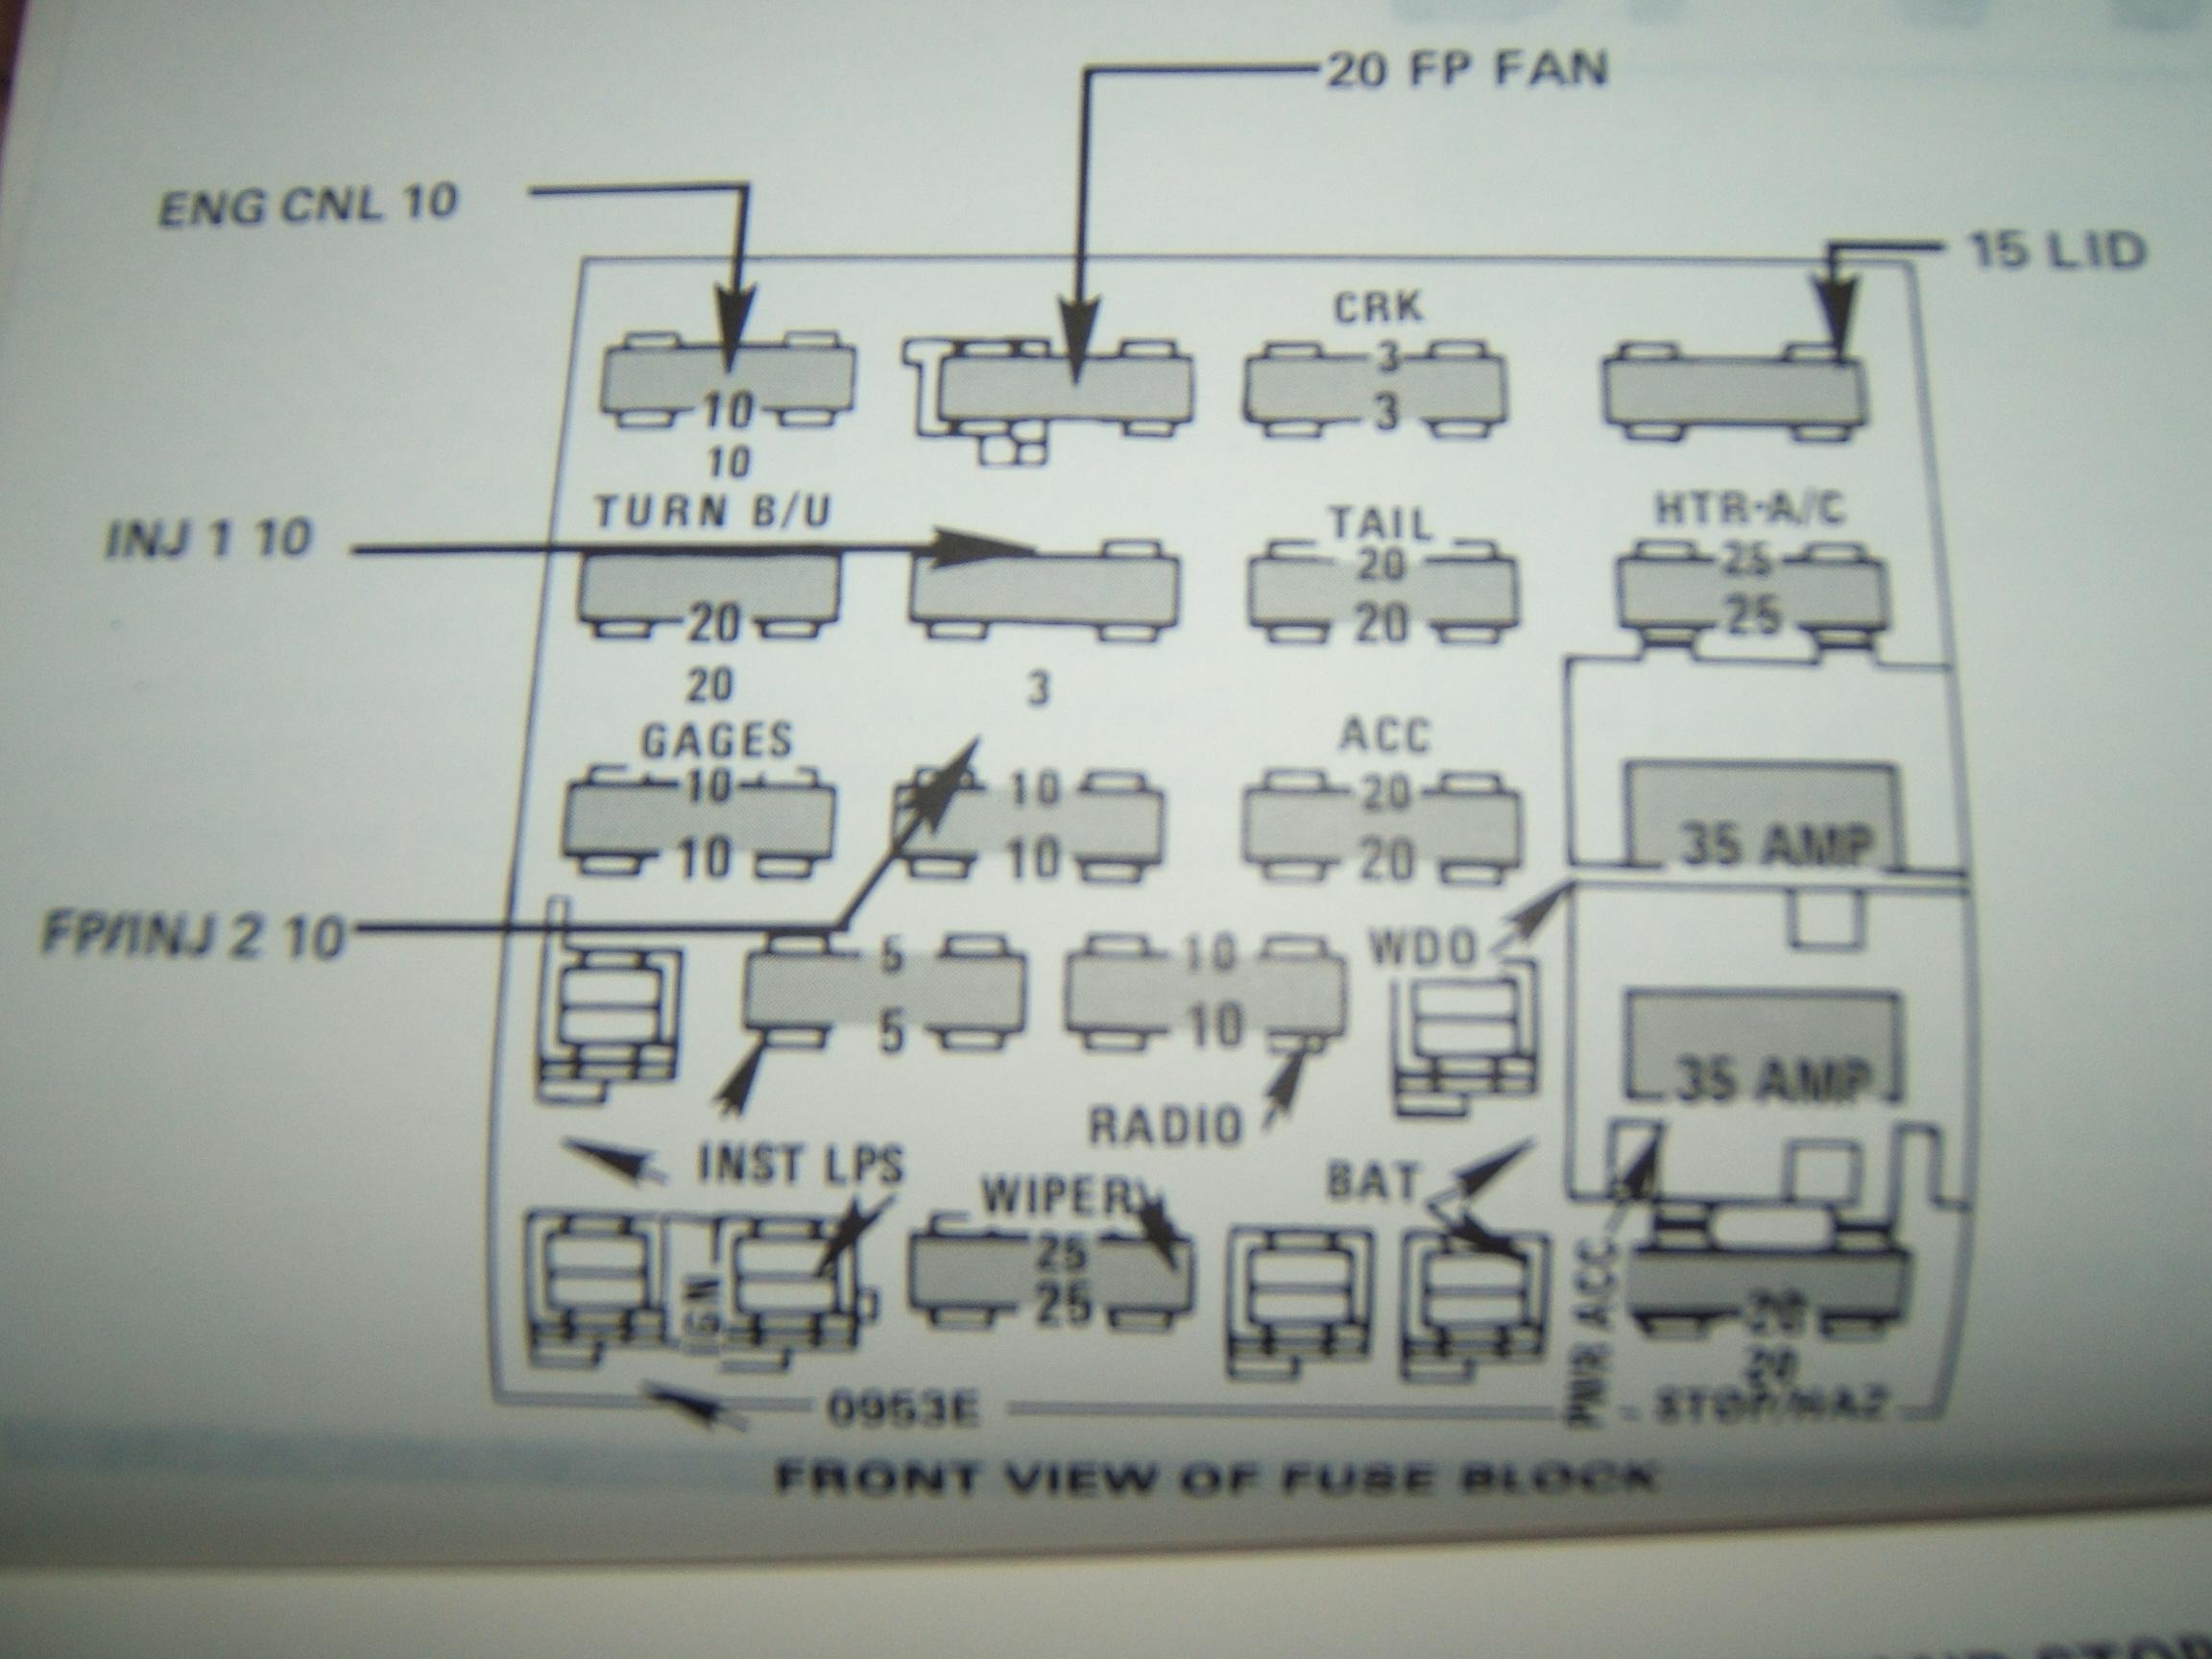 1988 camaro fuse box wiring diagrams cheap 2010 Camaro SS Fuse Box